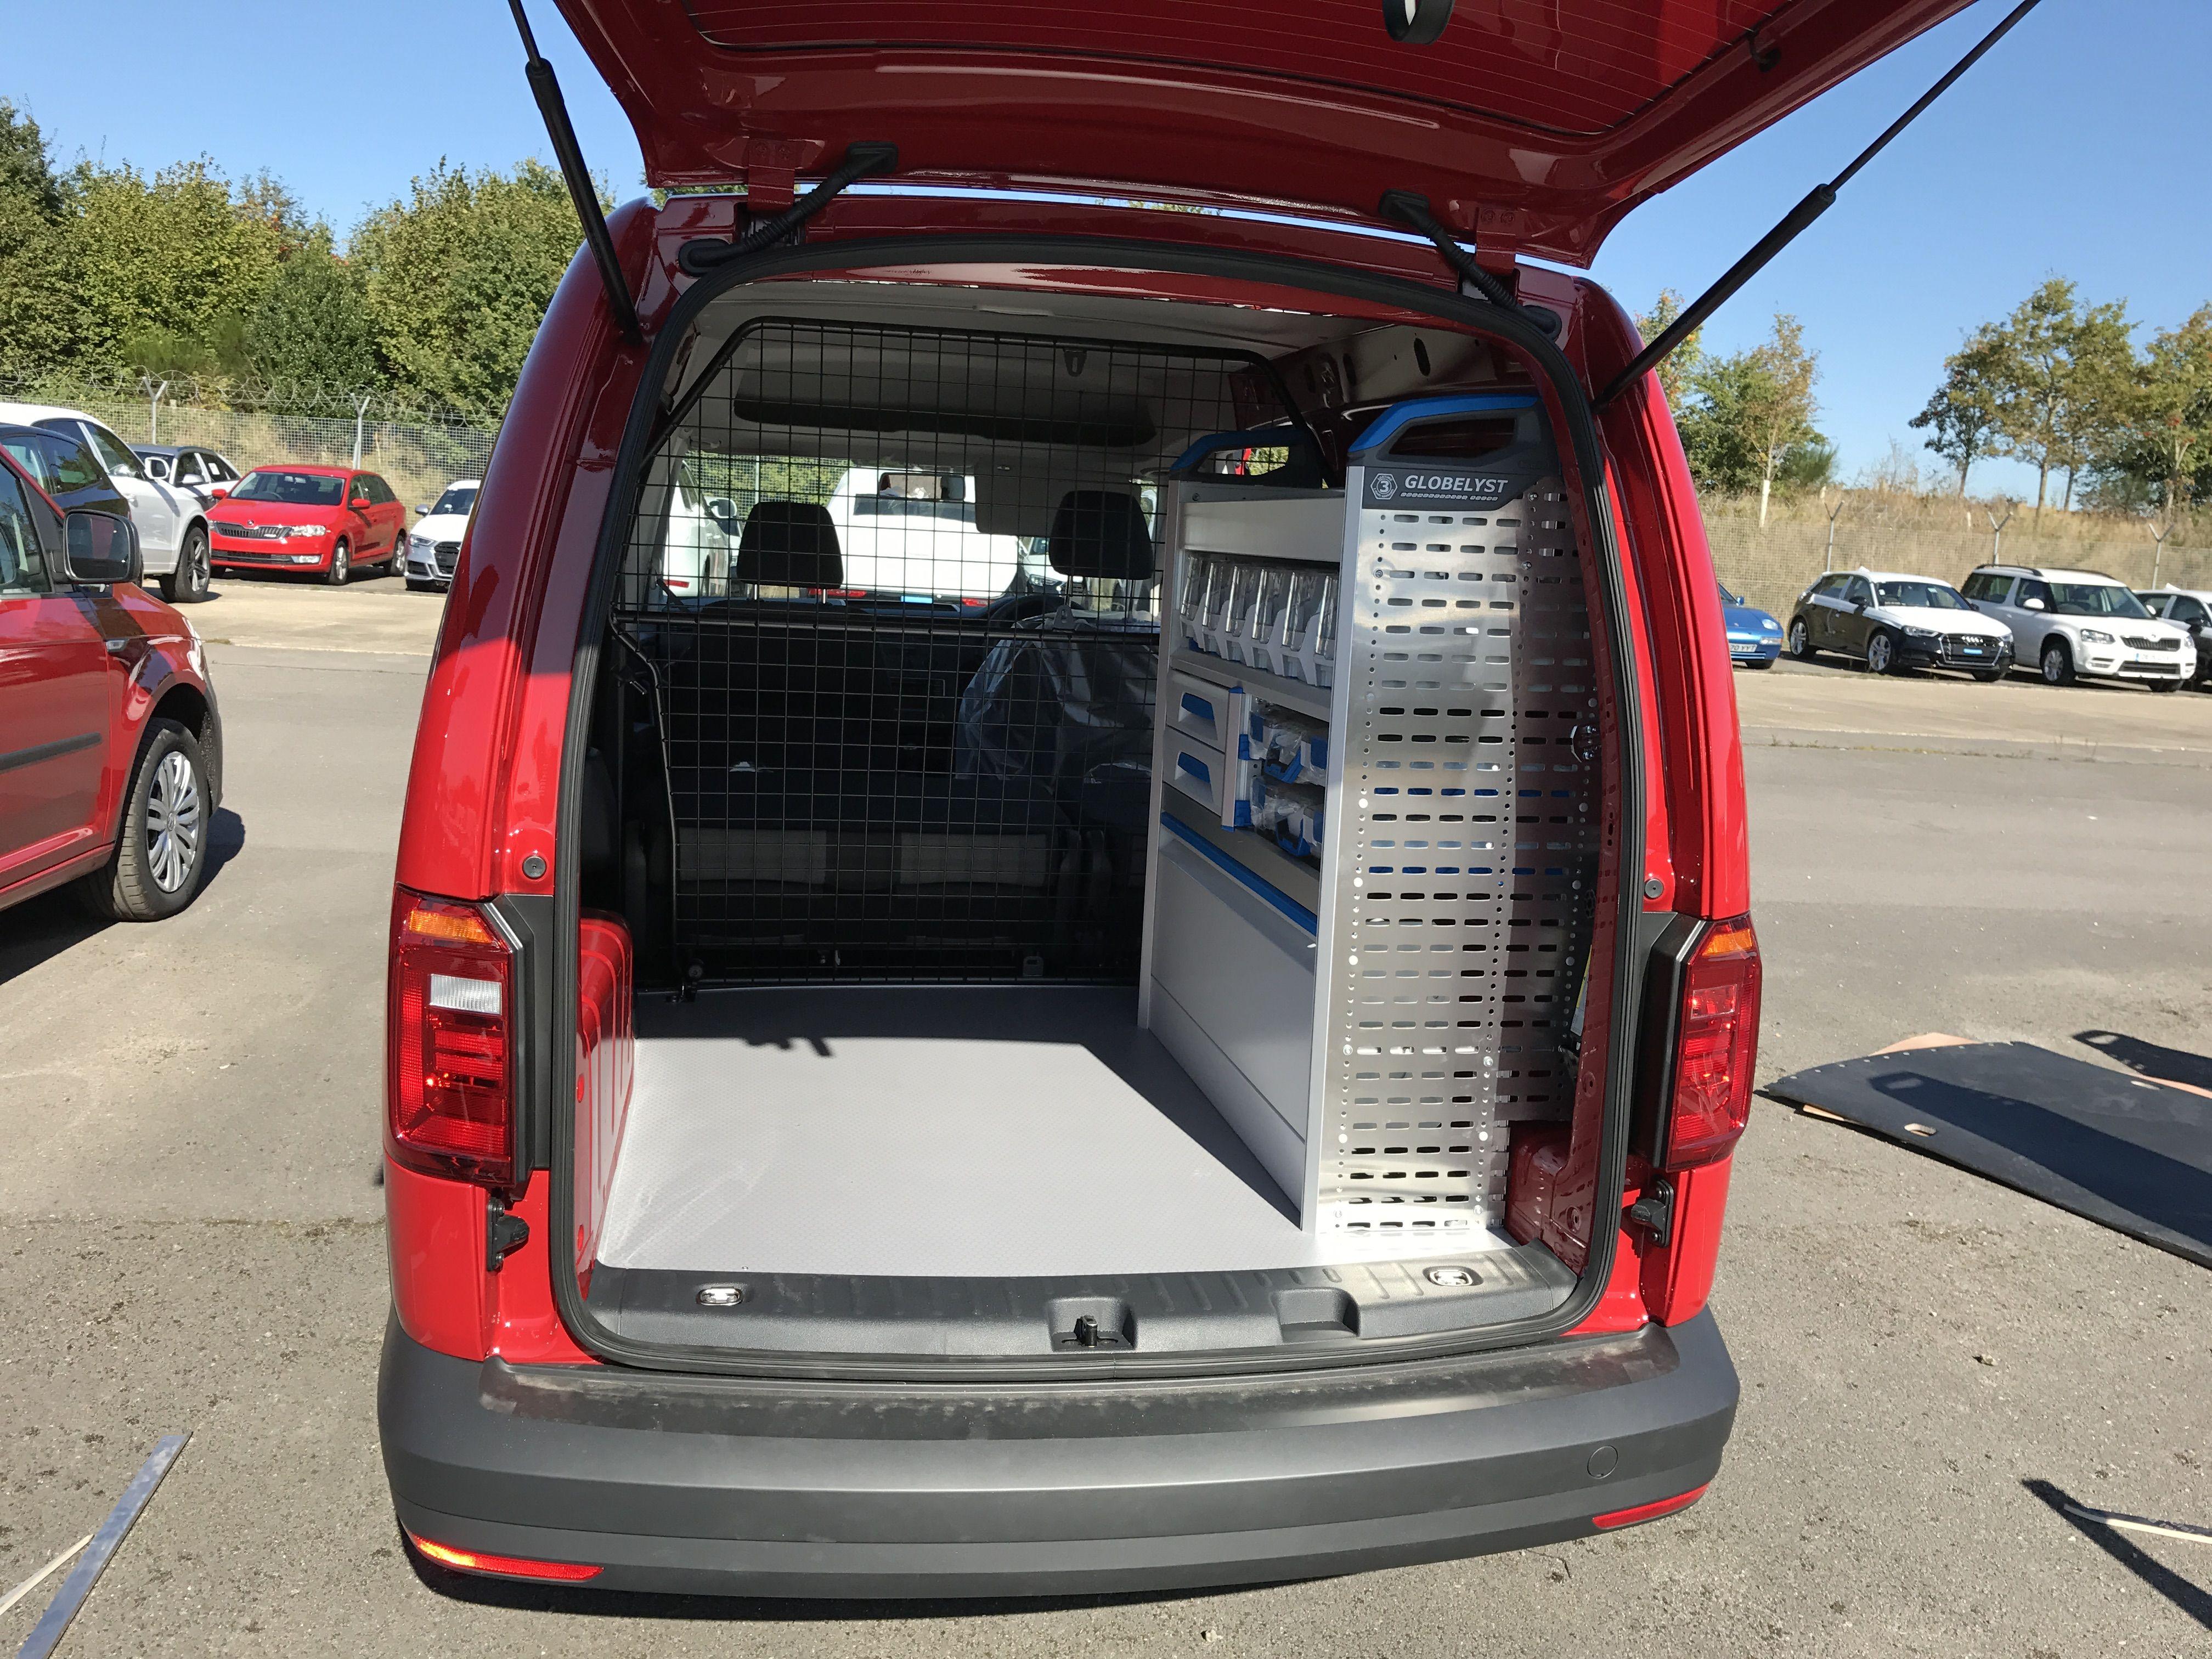 vw caddy sortimo racking auto ausbau ausbau und autos. Black Bedroom Furniture Sets. Home Design Ideas